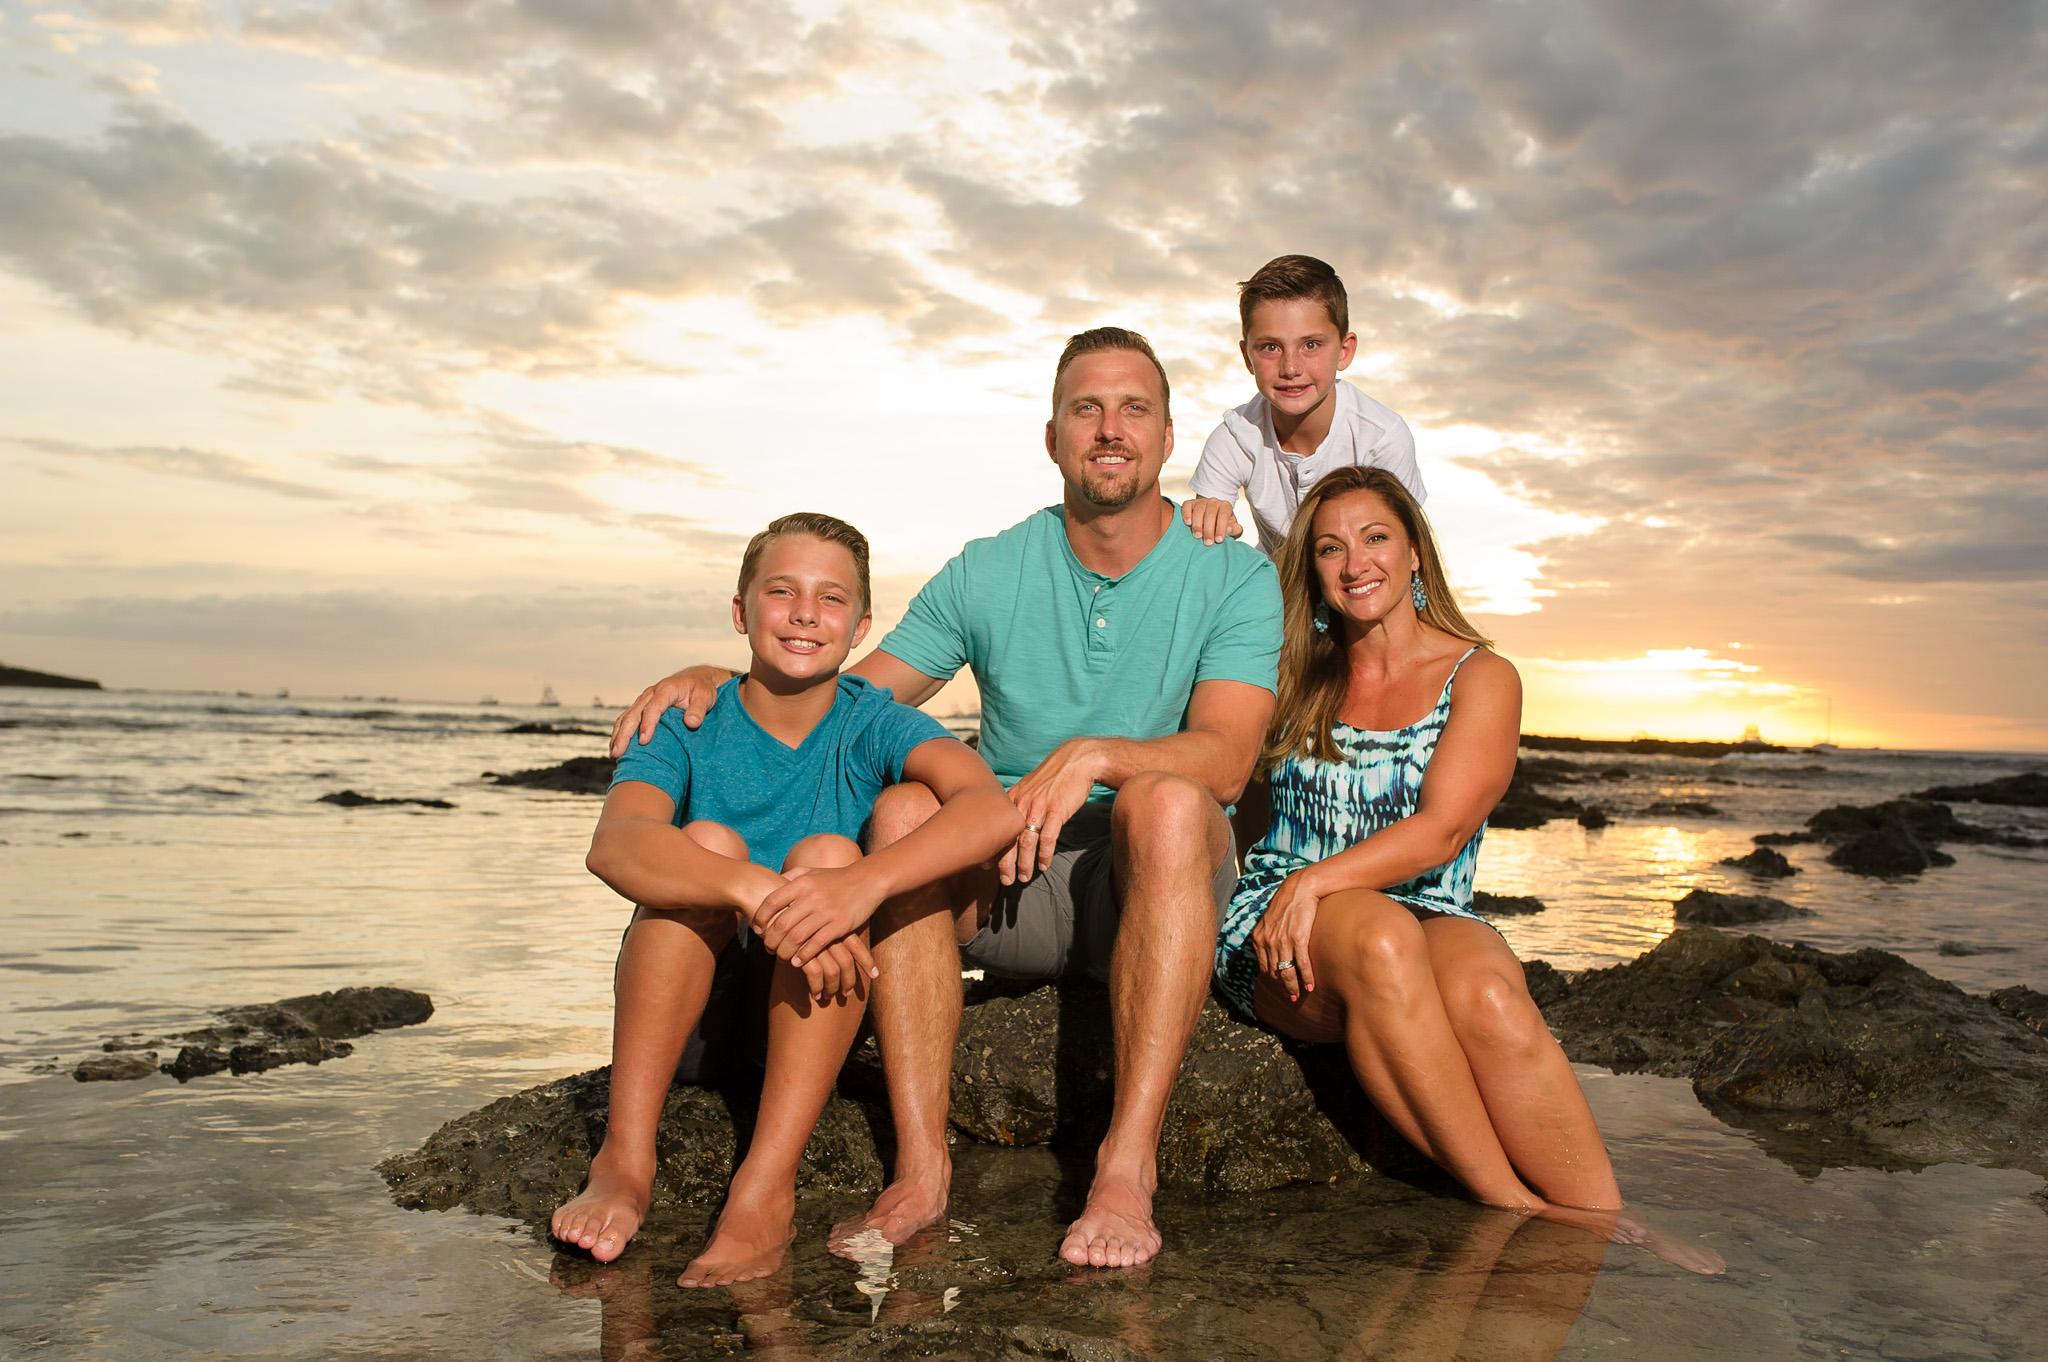 Family photos costa rica travel